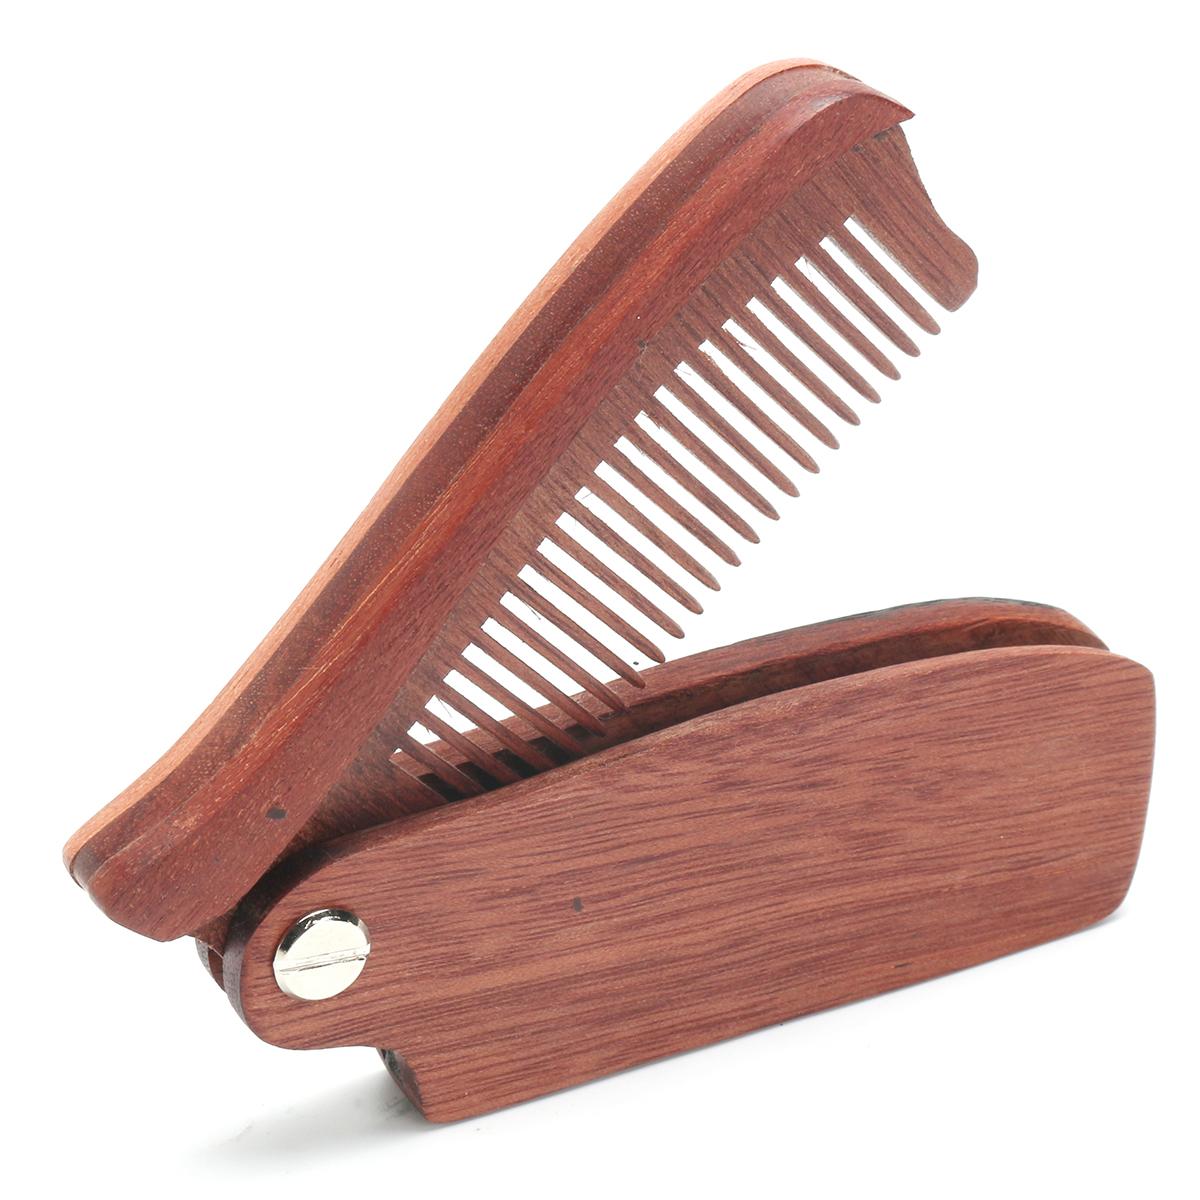 shaving mustache boar bristles beard comb folding wood brush shaping tool grooming care set man. Black Bedroom Furniture Sets. Home Design Ideas